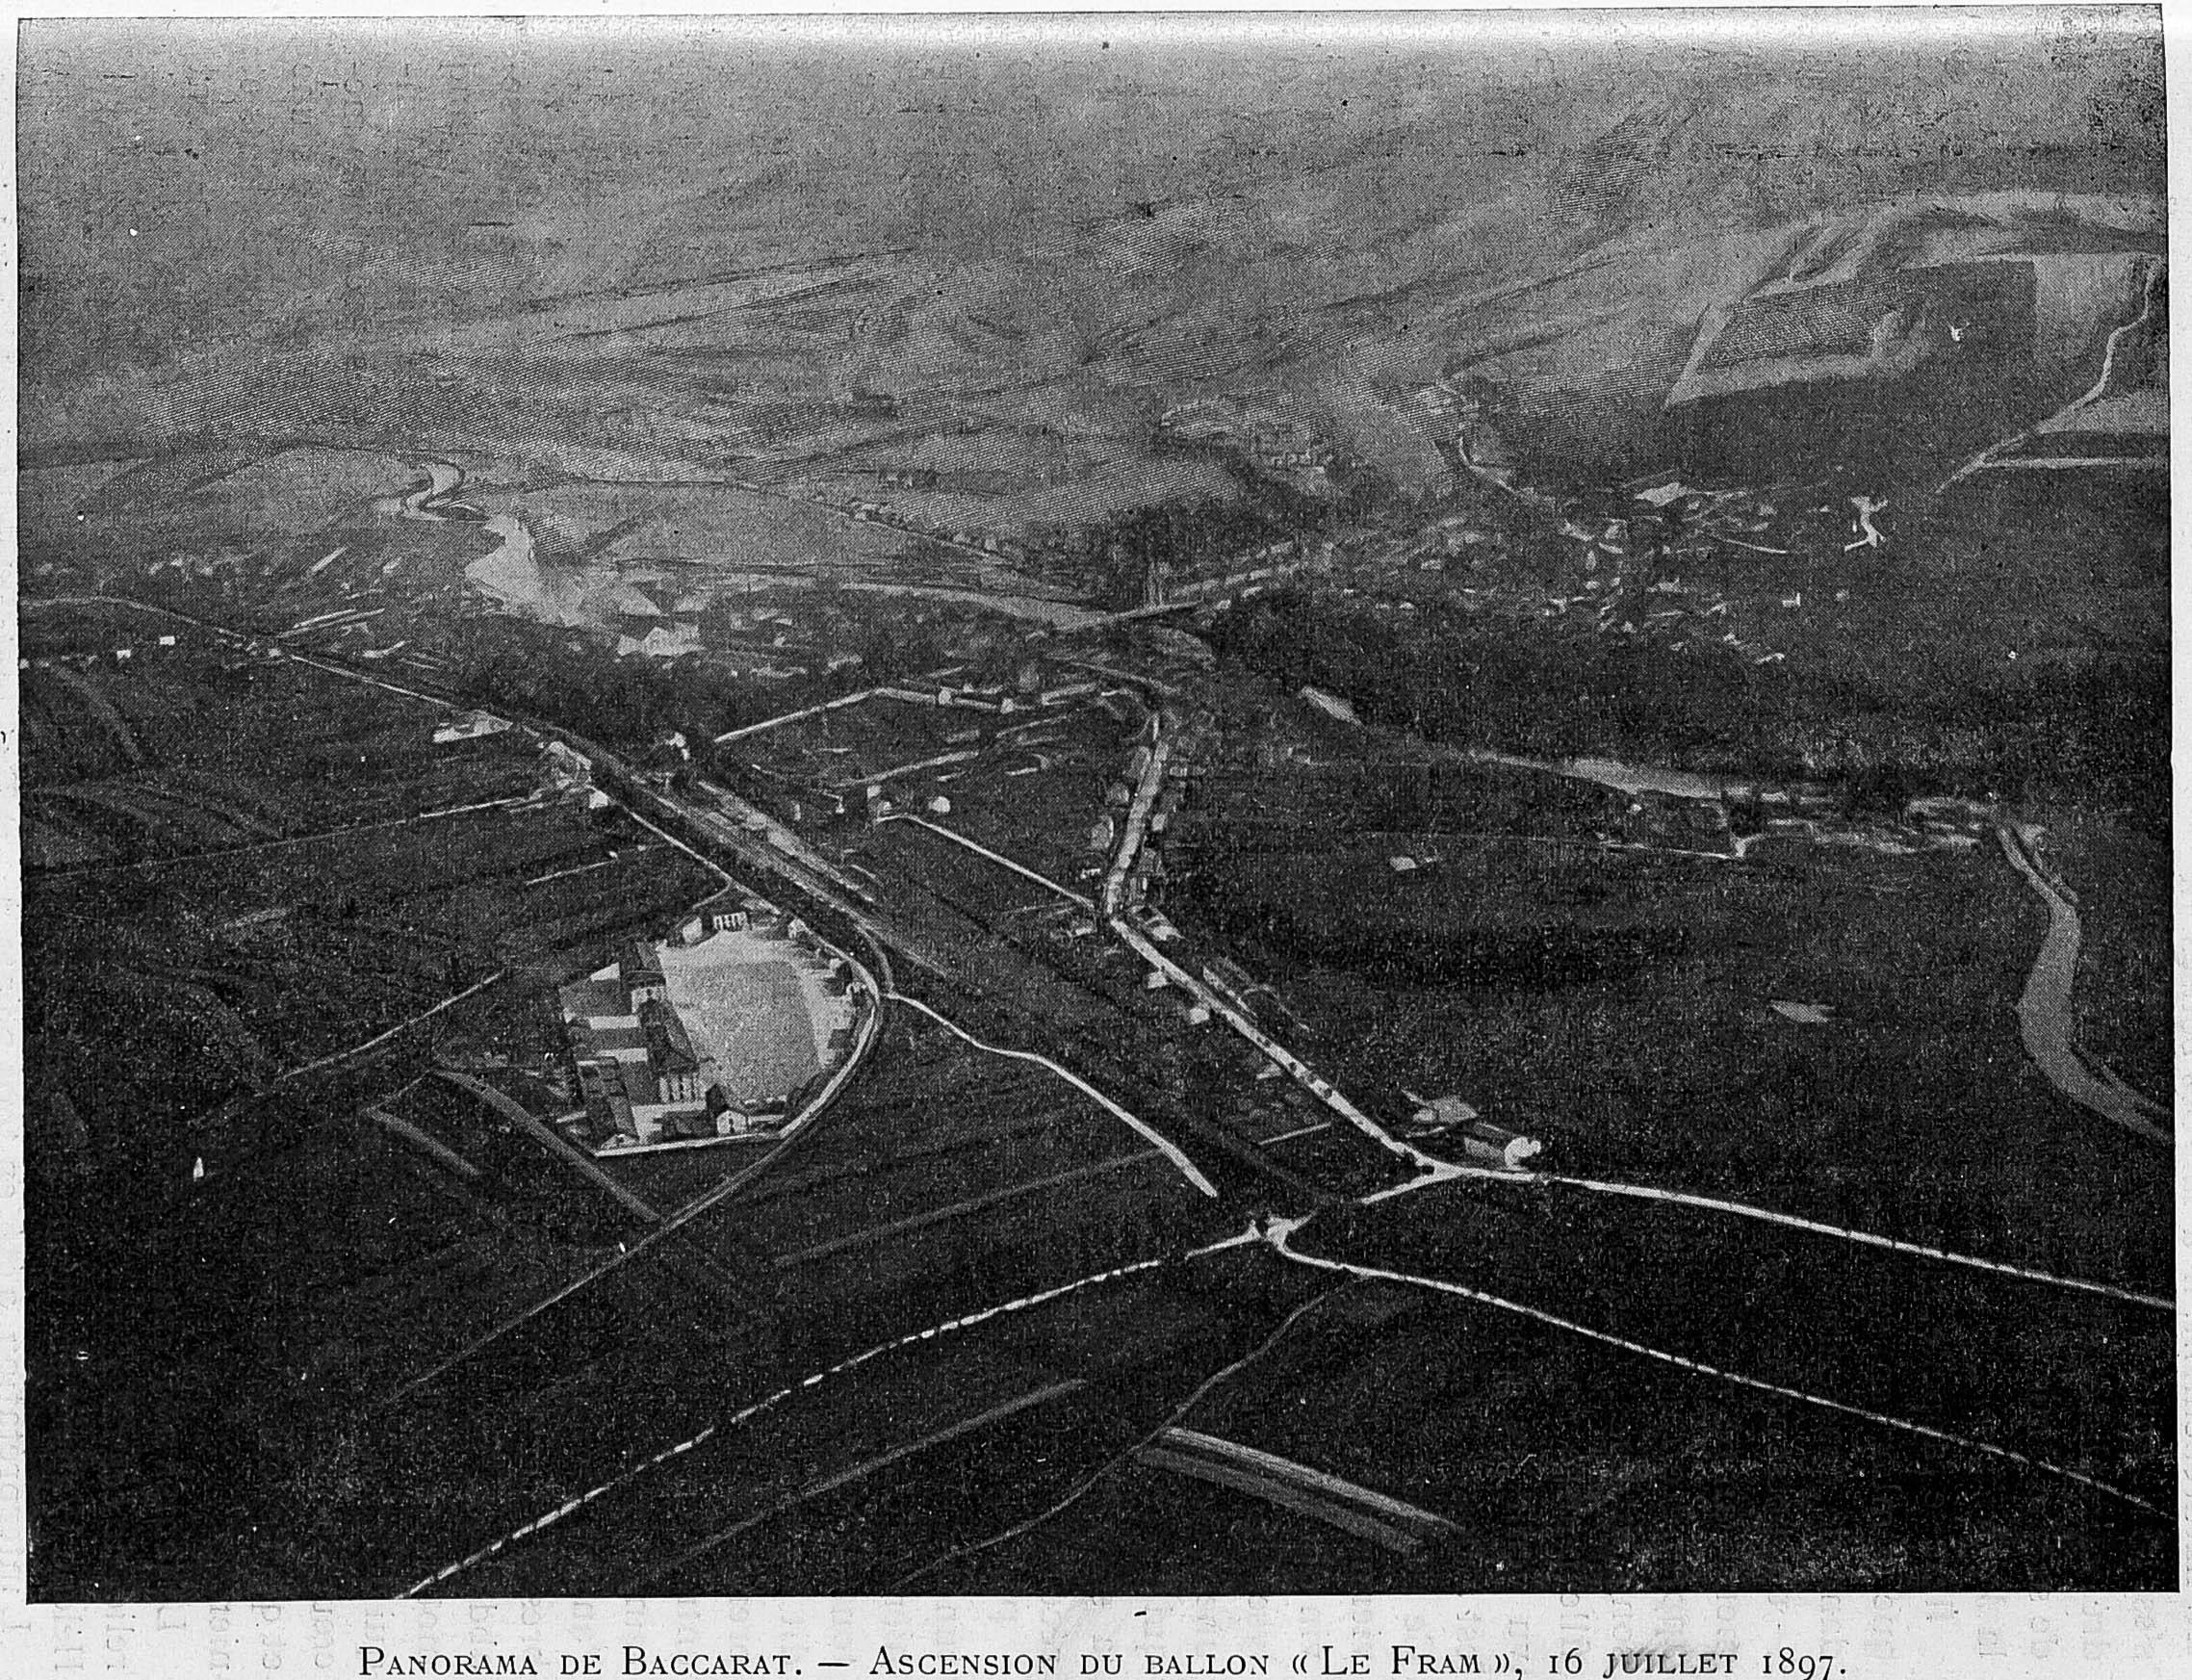 Contenu du Panorama de Baccarat